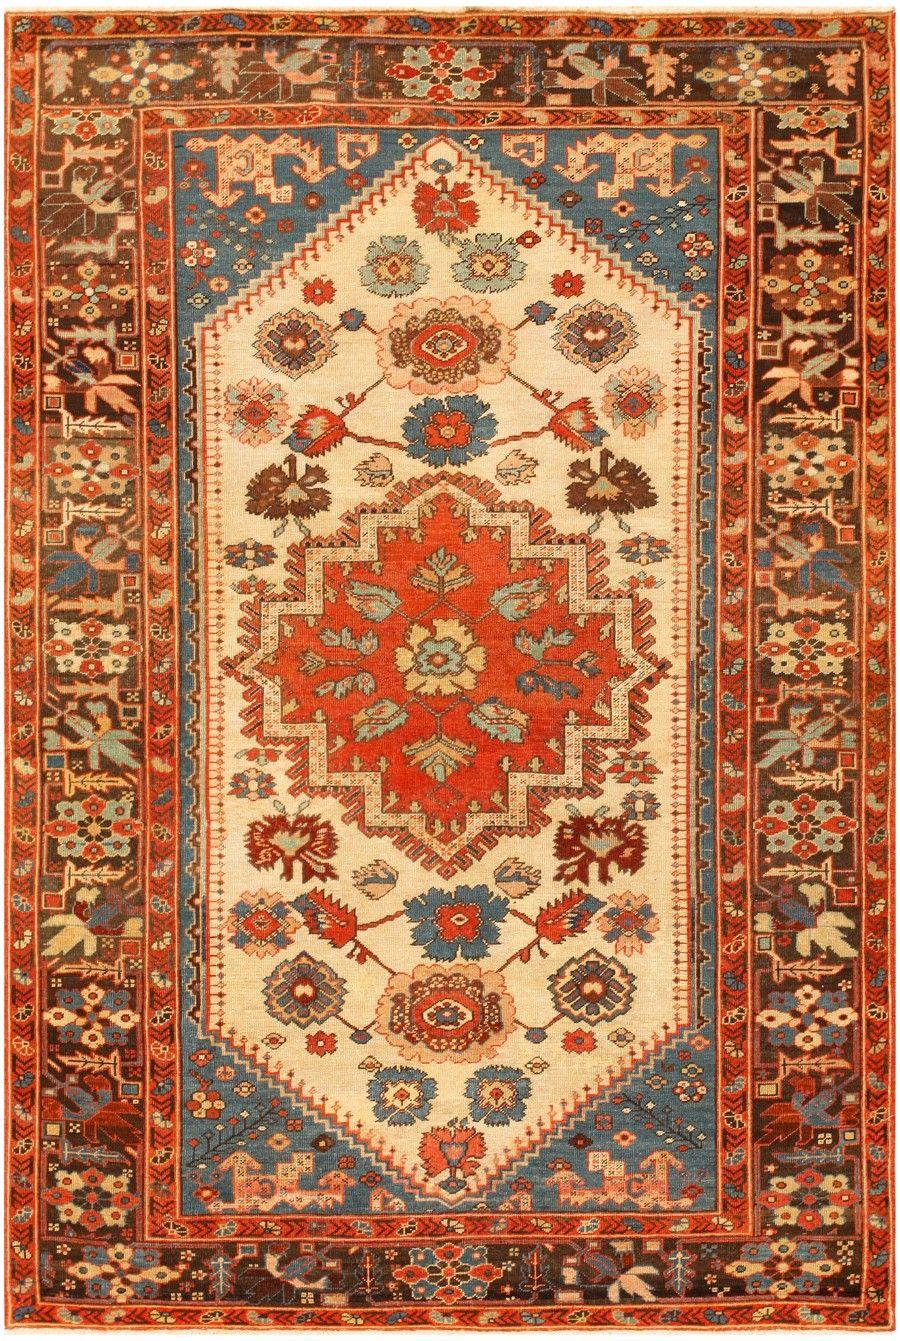 Tribal Small Antique Persian Bakshaish Rug 46542 In 2019